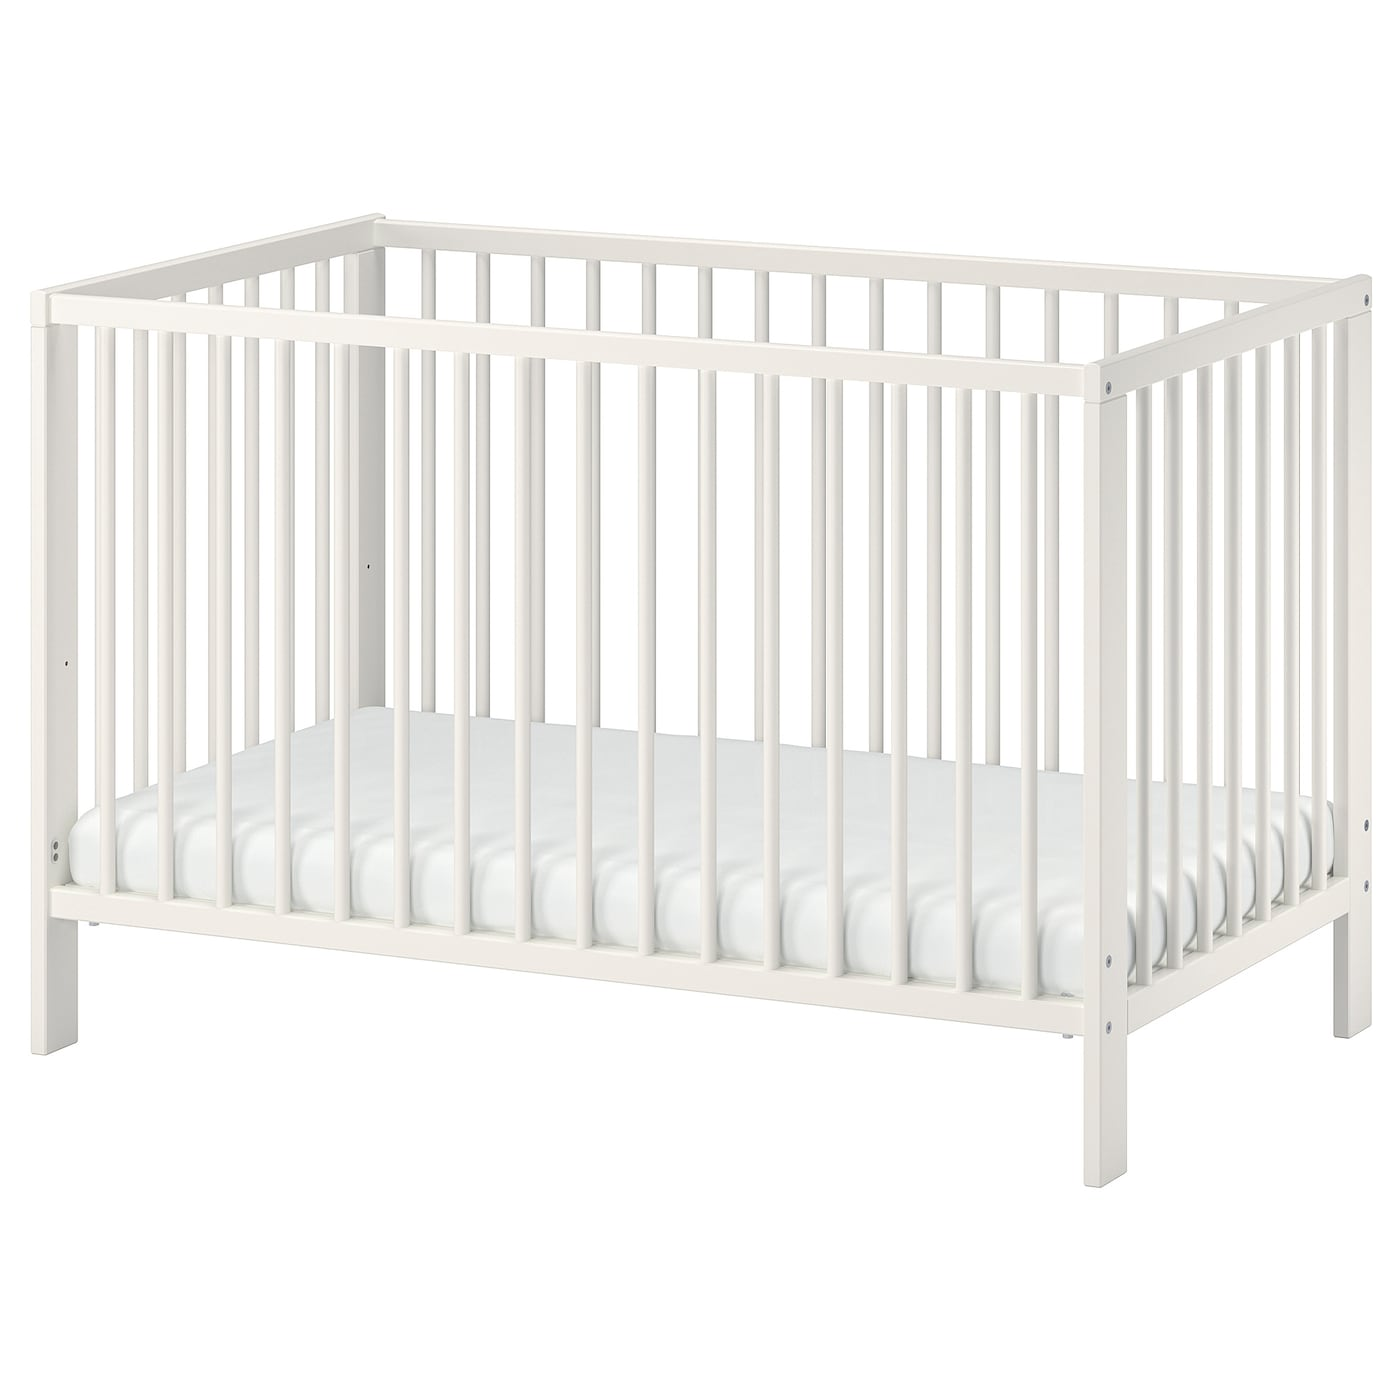 IKEA - GULLIVER Babybedje - 60x120 cm